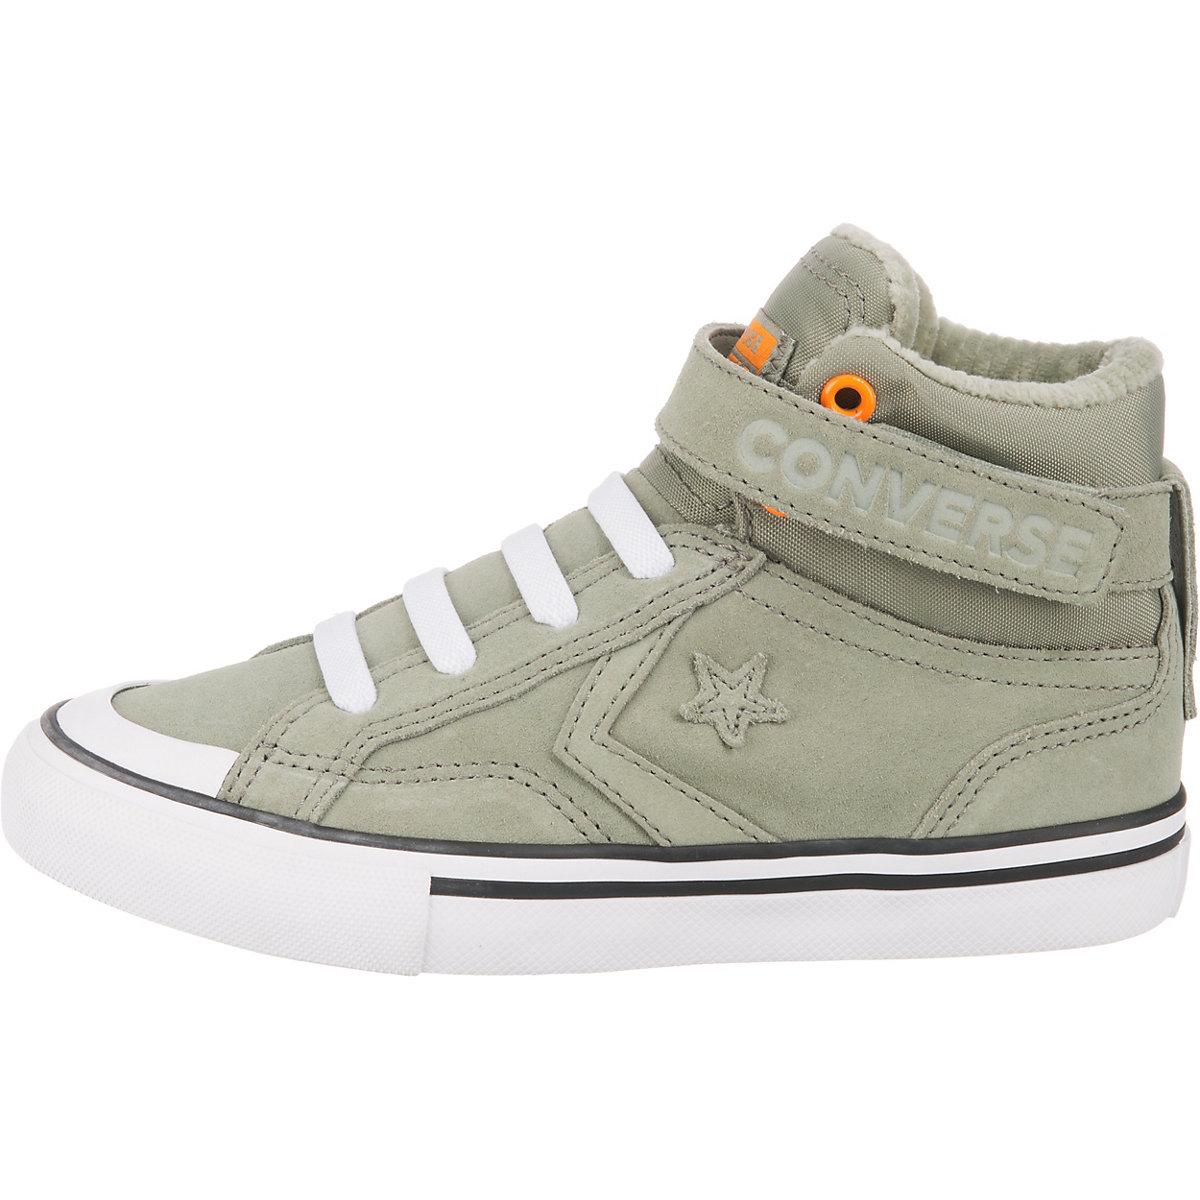 Converse, Sneakers High Pro Blaze Strap Hi Für Jungen, Grün